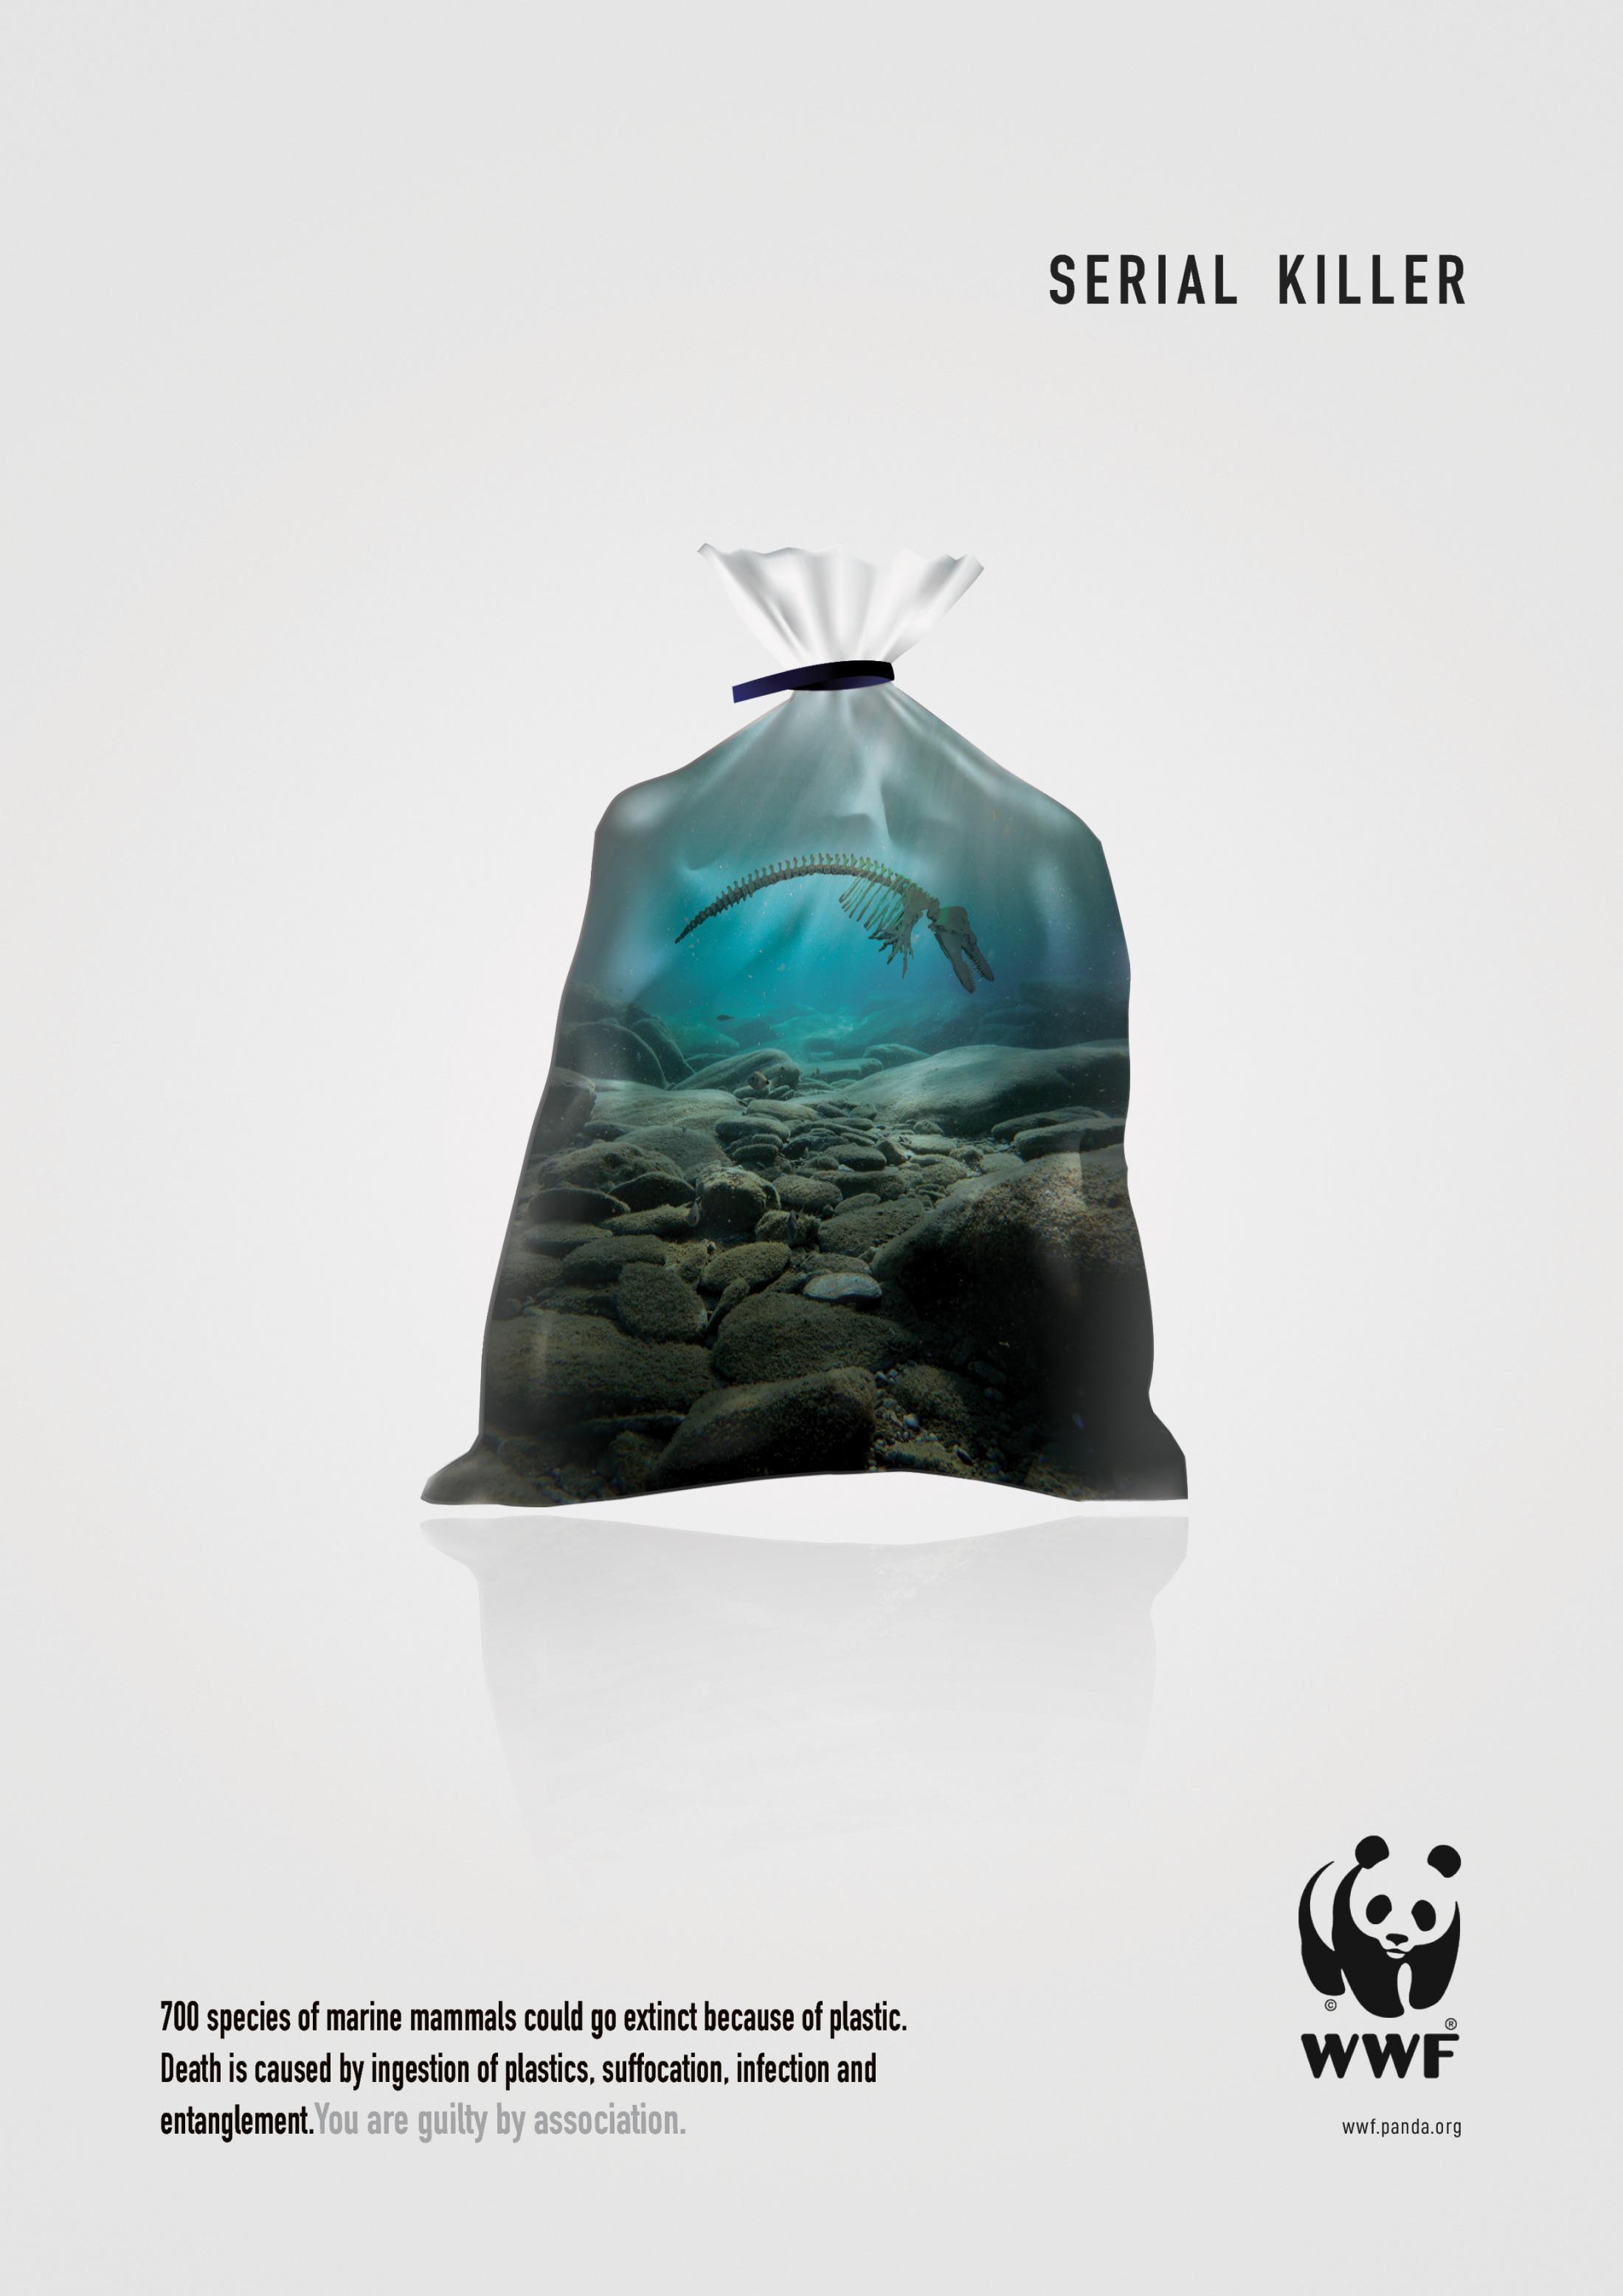 WWF: Serial Killer - Mammal